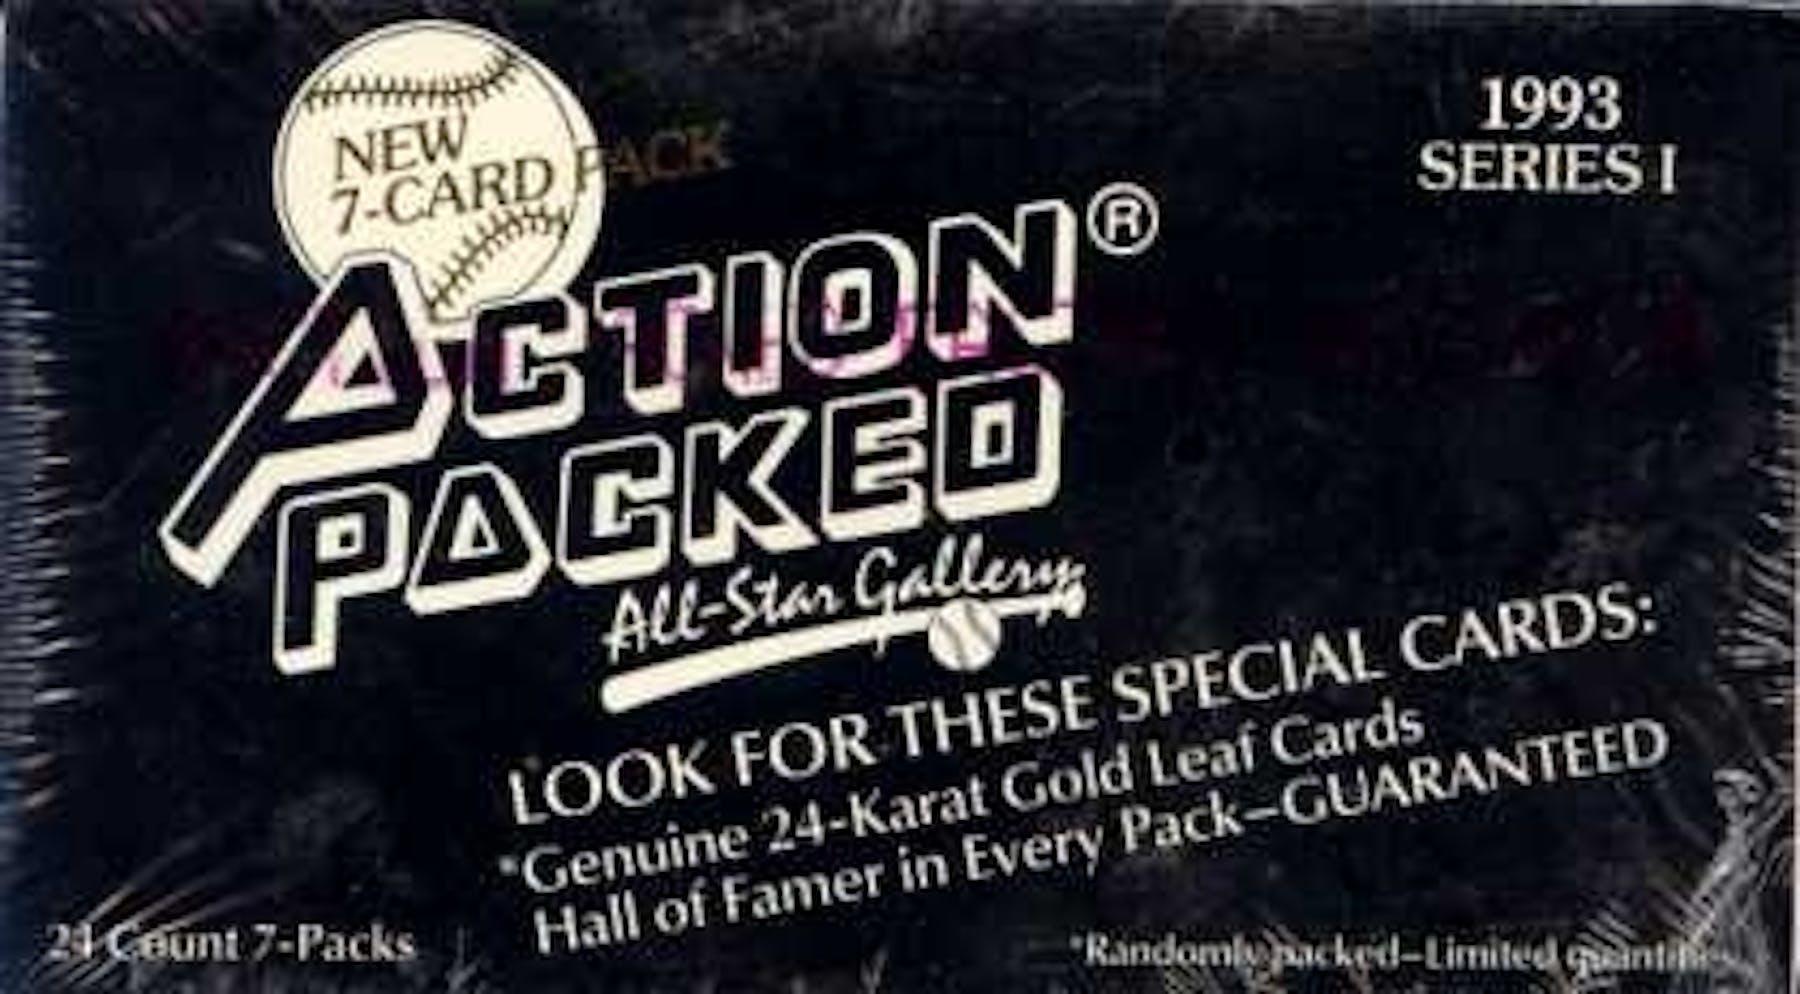 1993 Action Packed All Star Gallery Series 1 Baseball Wax Box Da